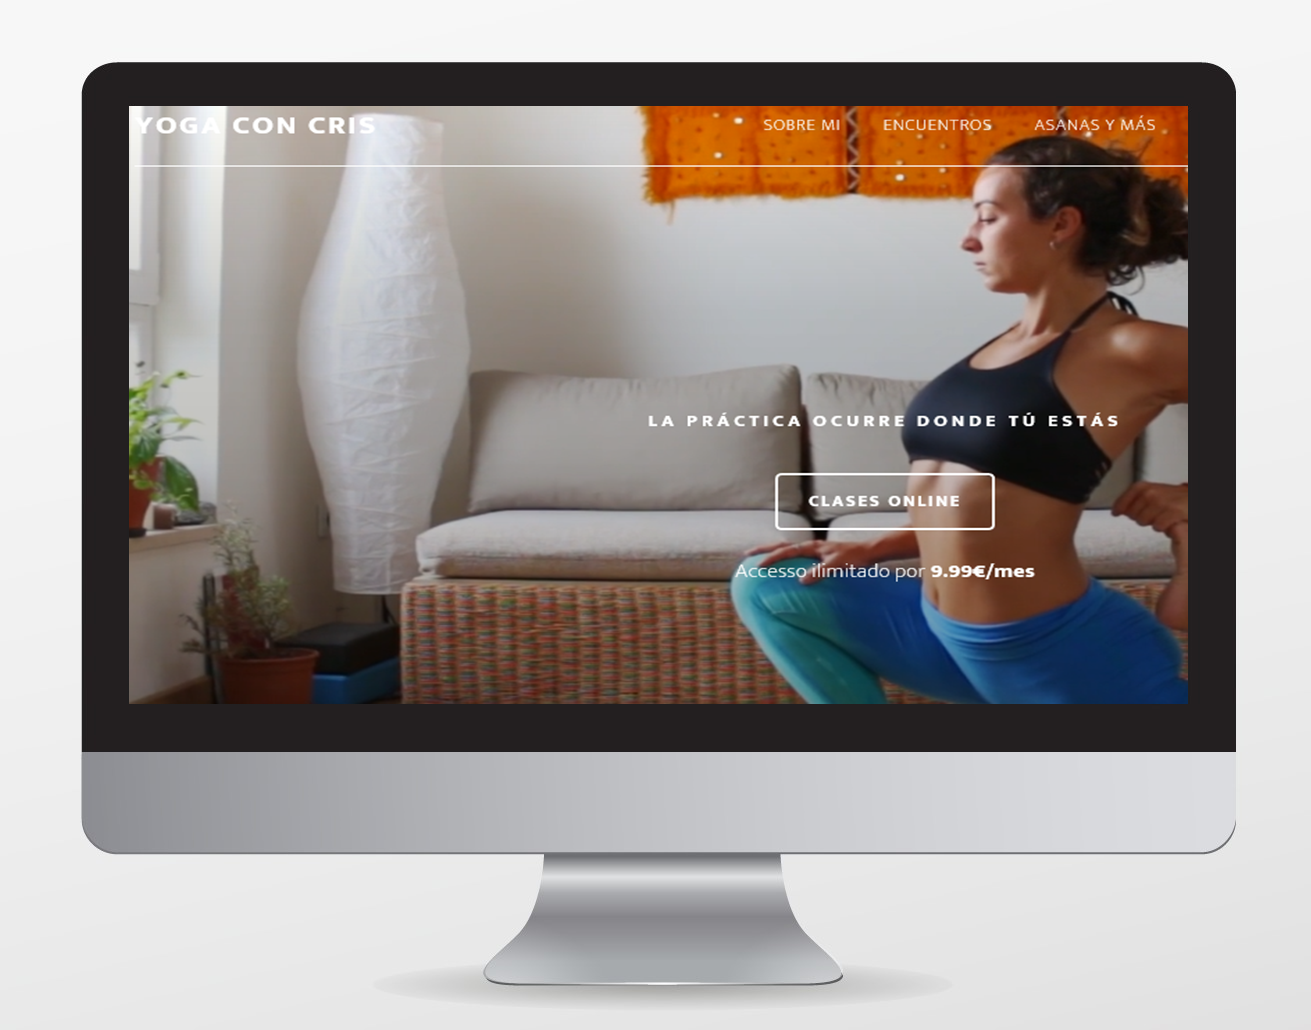 Mis 20 mejores blogs de yoga en español - Laura Santisteban